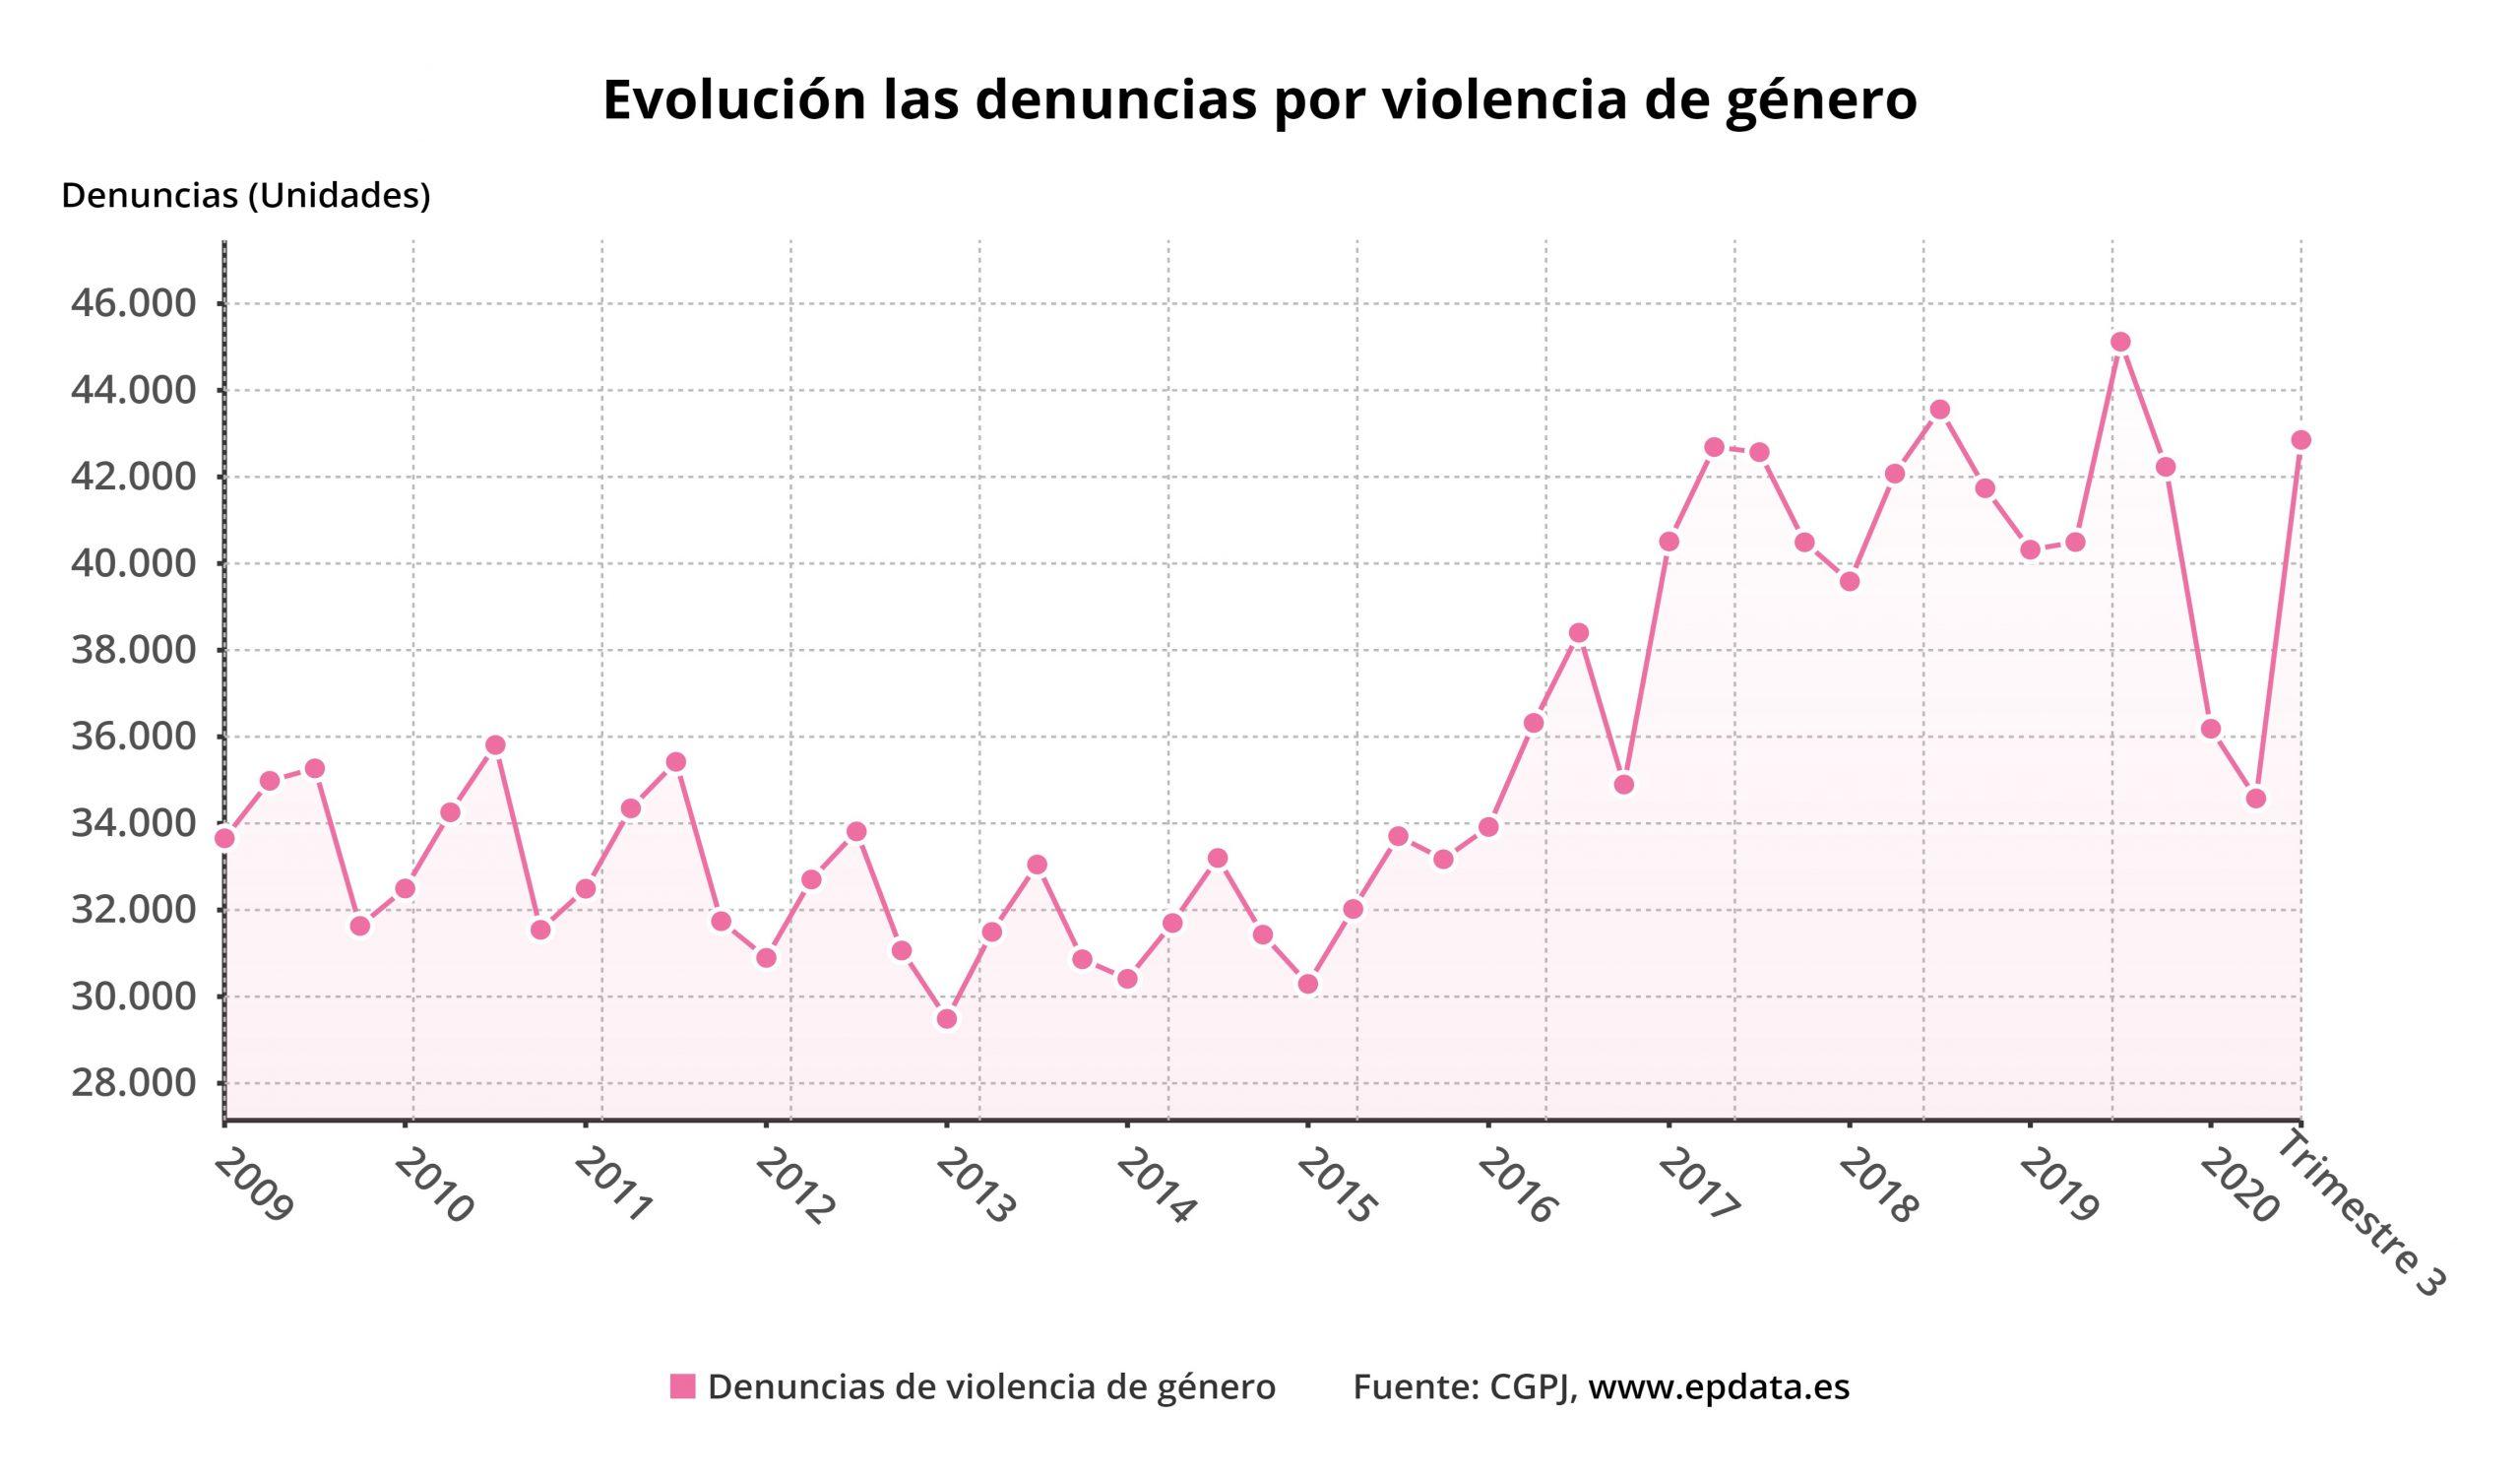 evolucion_las_denuncias_p